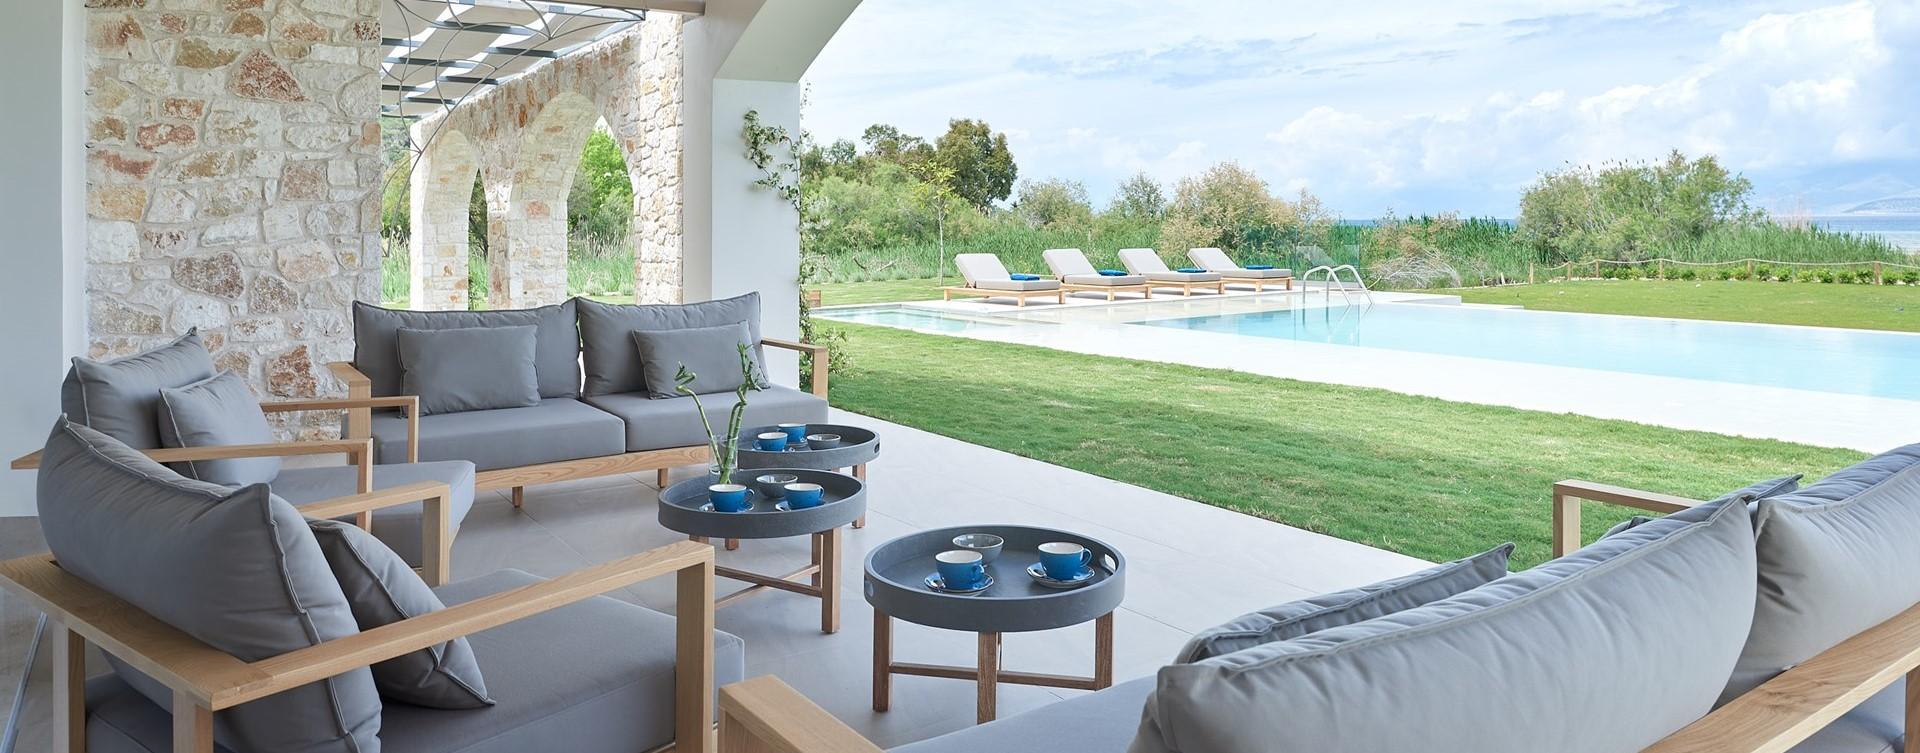 large-family-pool-villa-corfu-greece